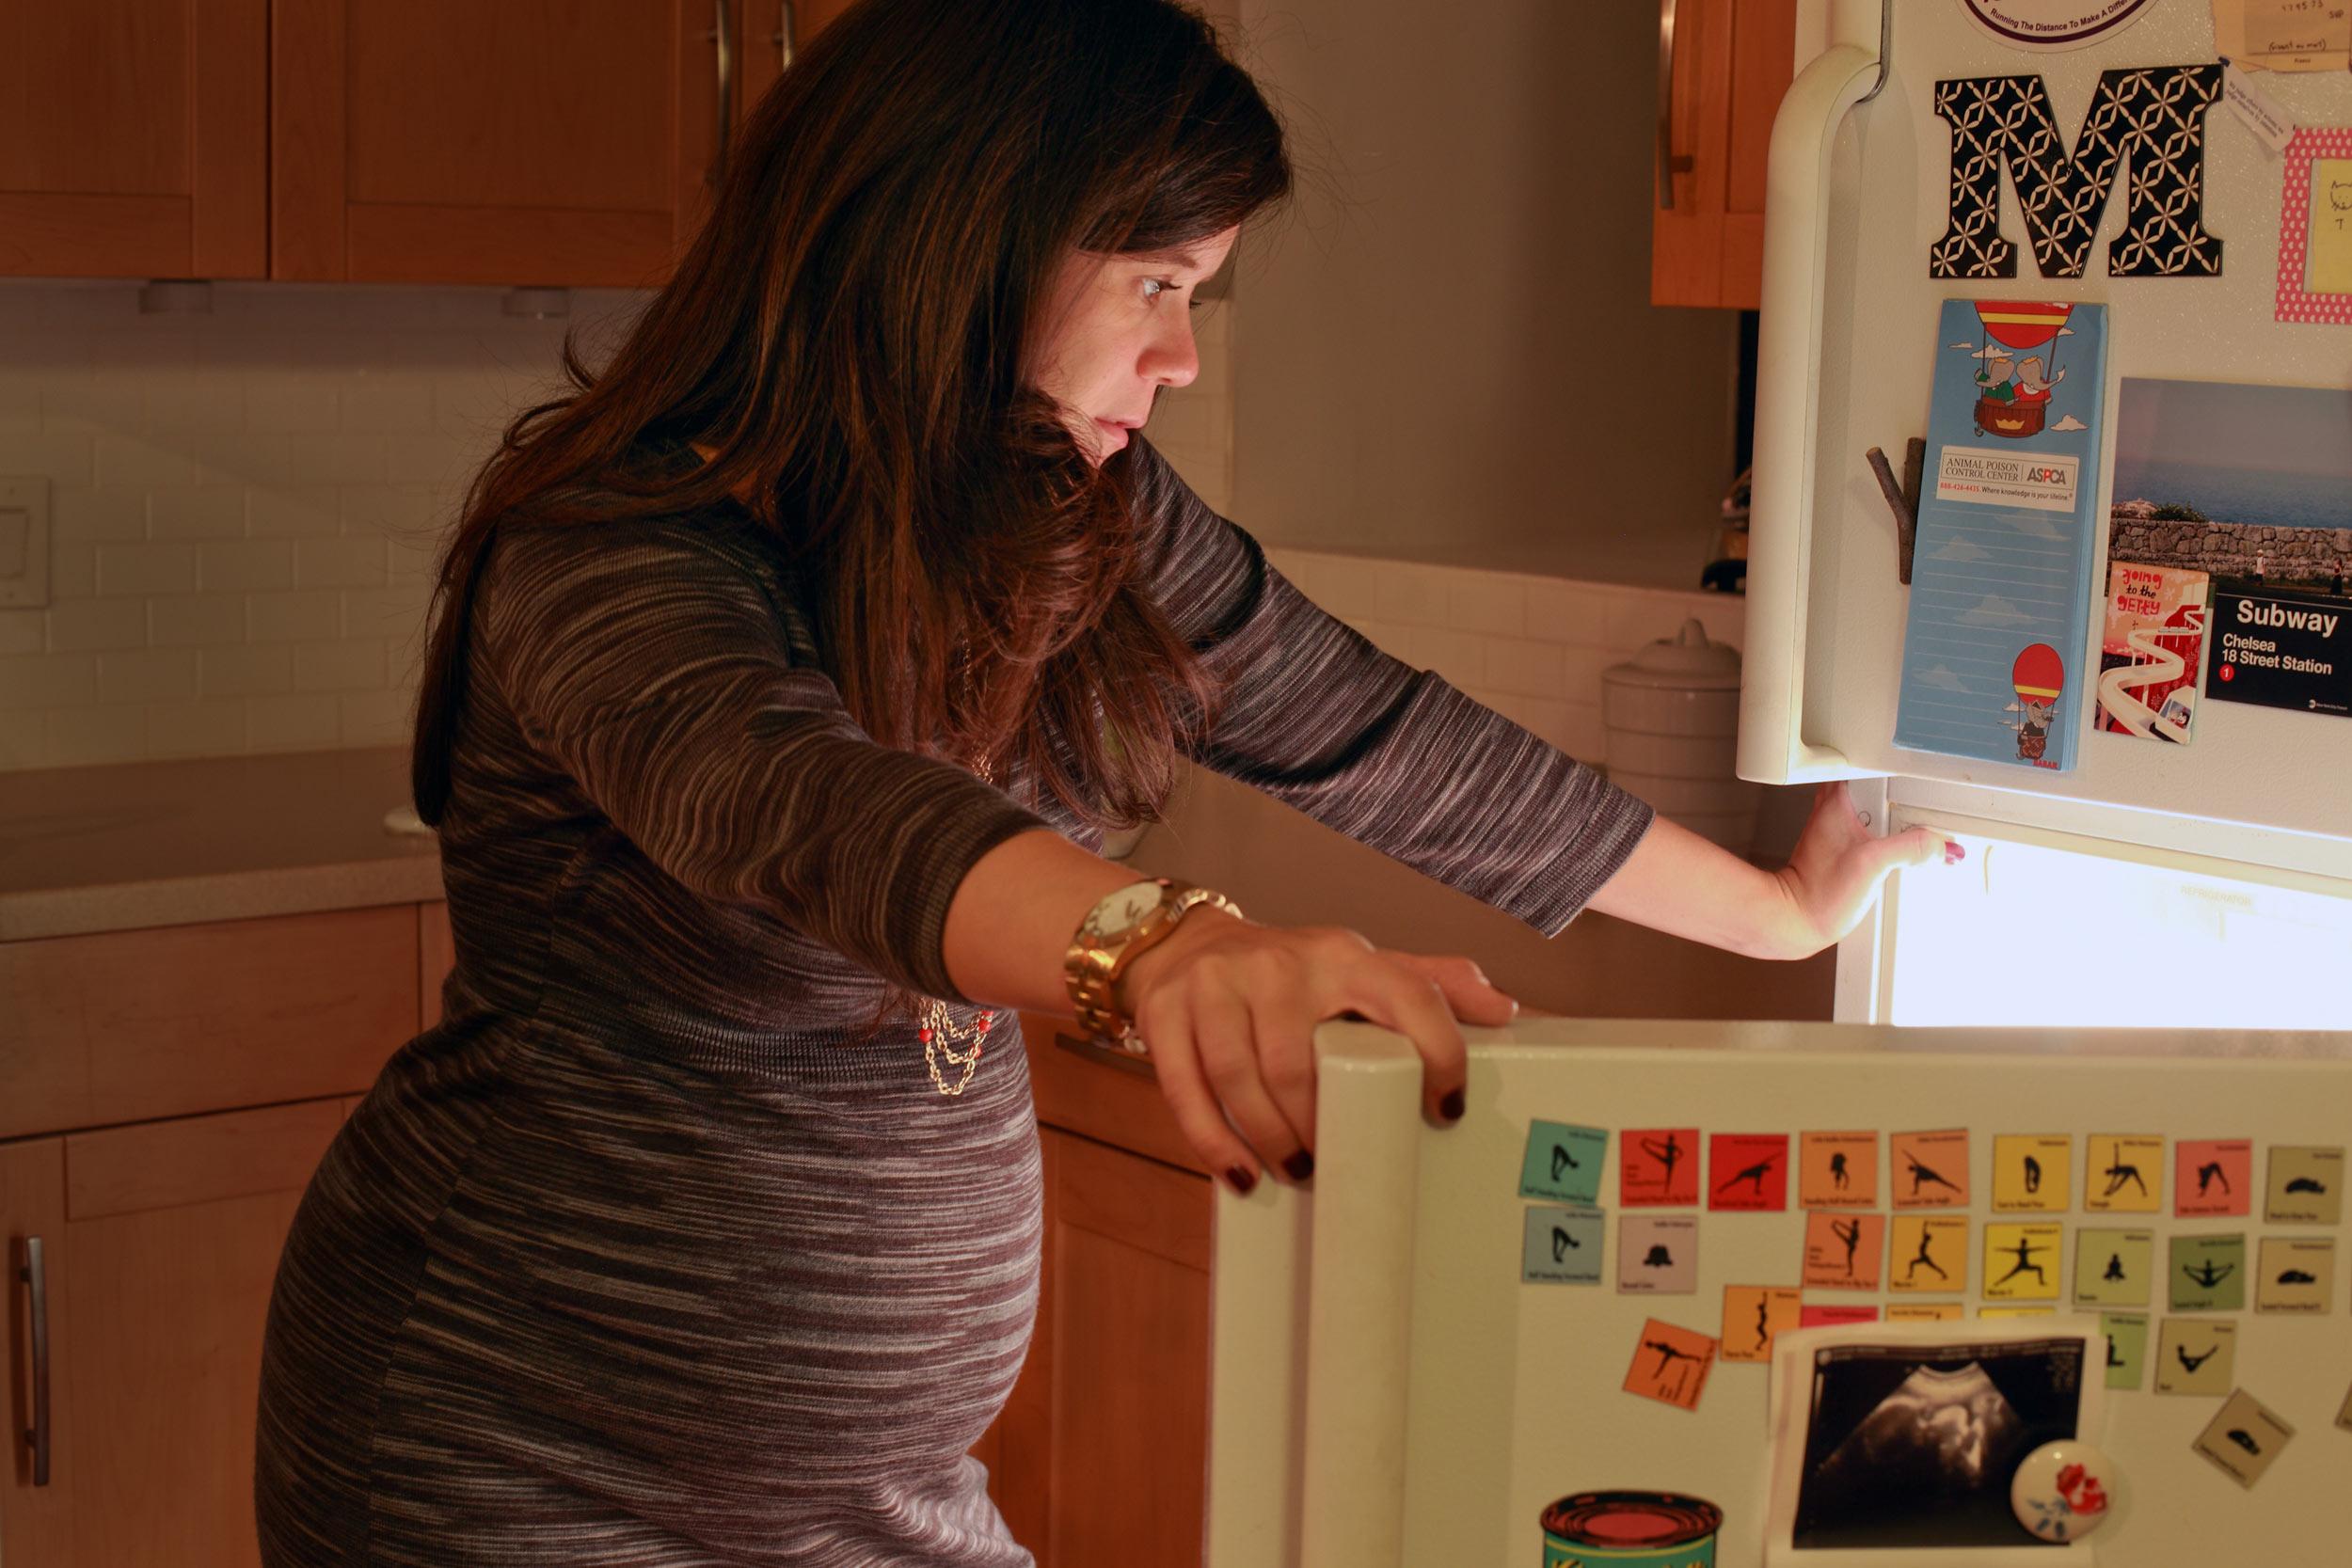 showing-slideshow-refrigerator-tony-gonzalez.jpg